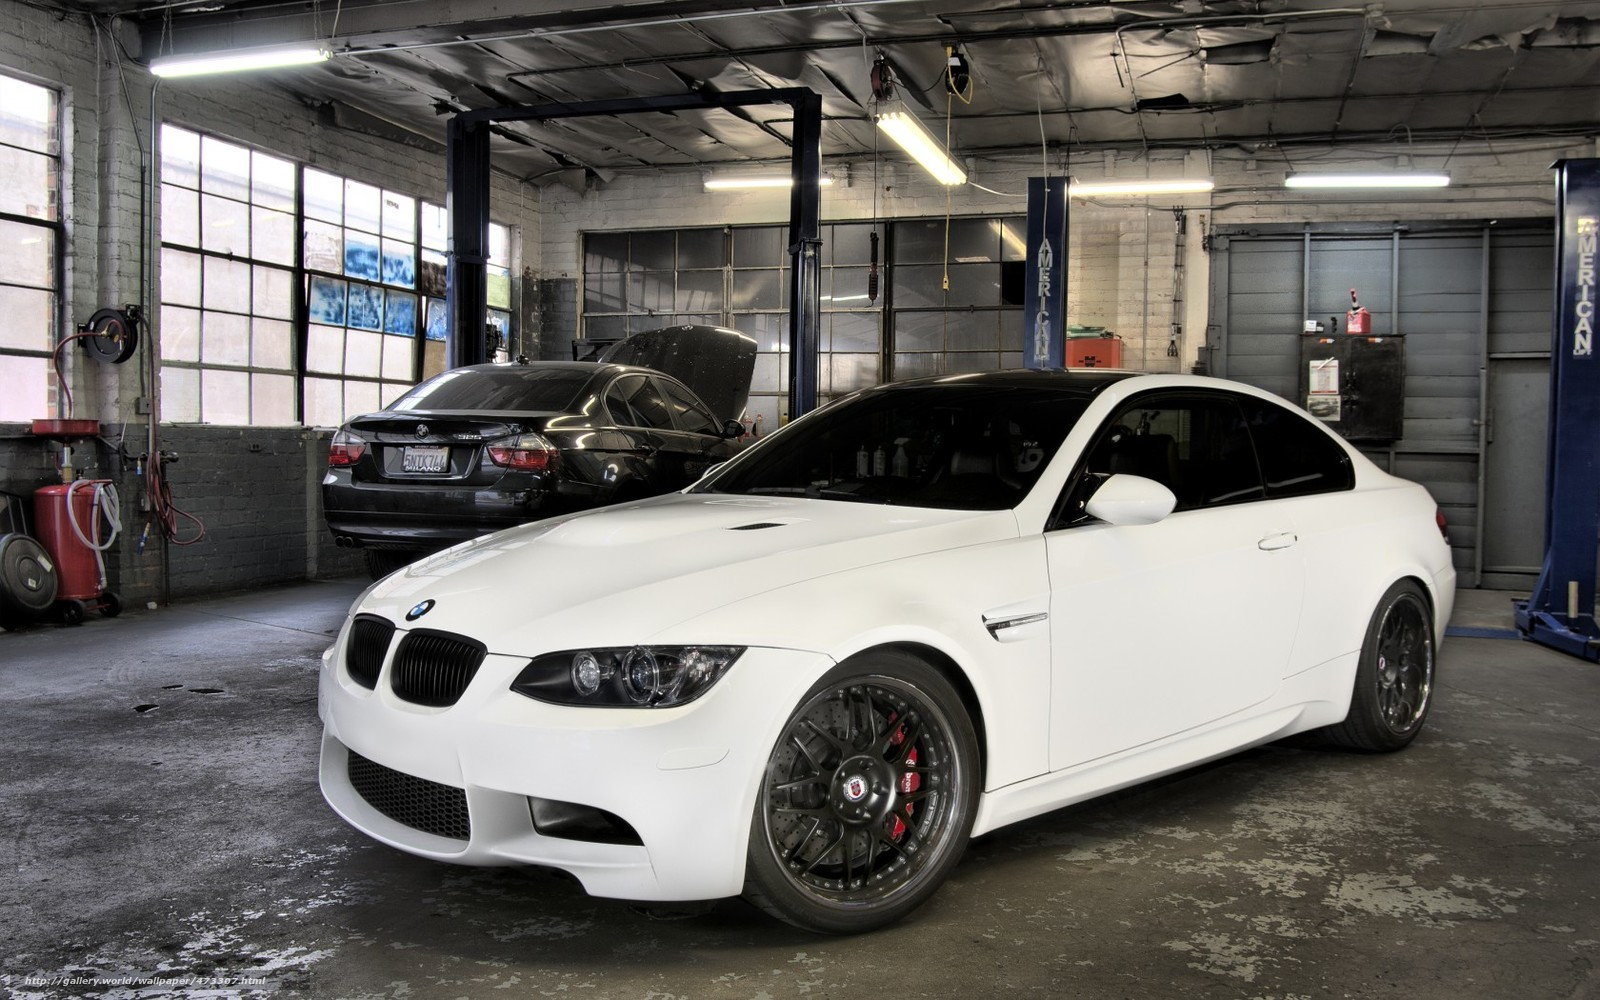 Download wallpaper BMW,  white,  Black,  workshop free desktop wallpaper in the resolution 1680x1050 — picture №473307